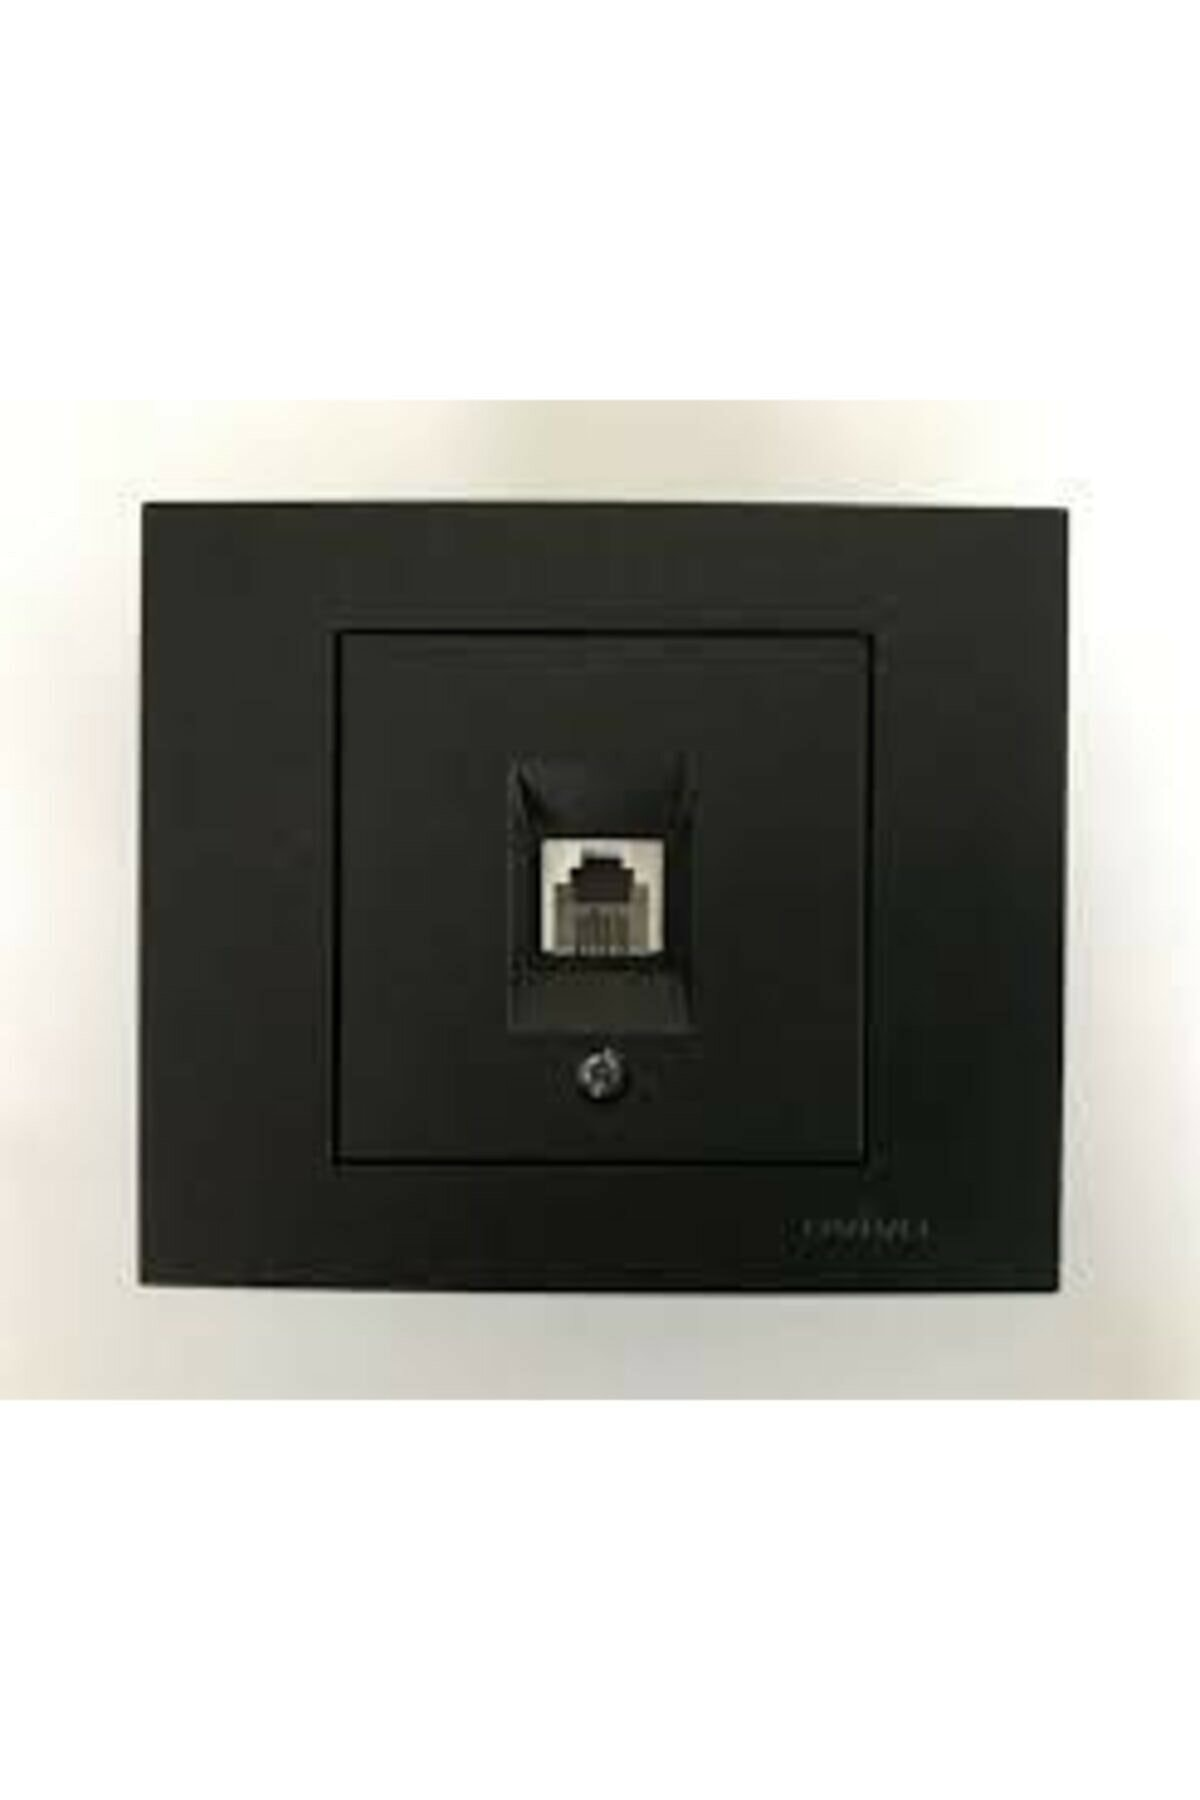 Grano Siyah Numeris Telefon Prizi Cat3 Mekanizma  Çerçeve